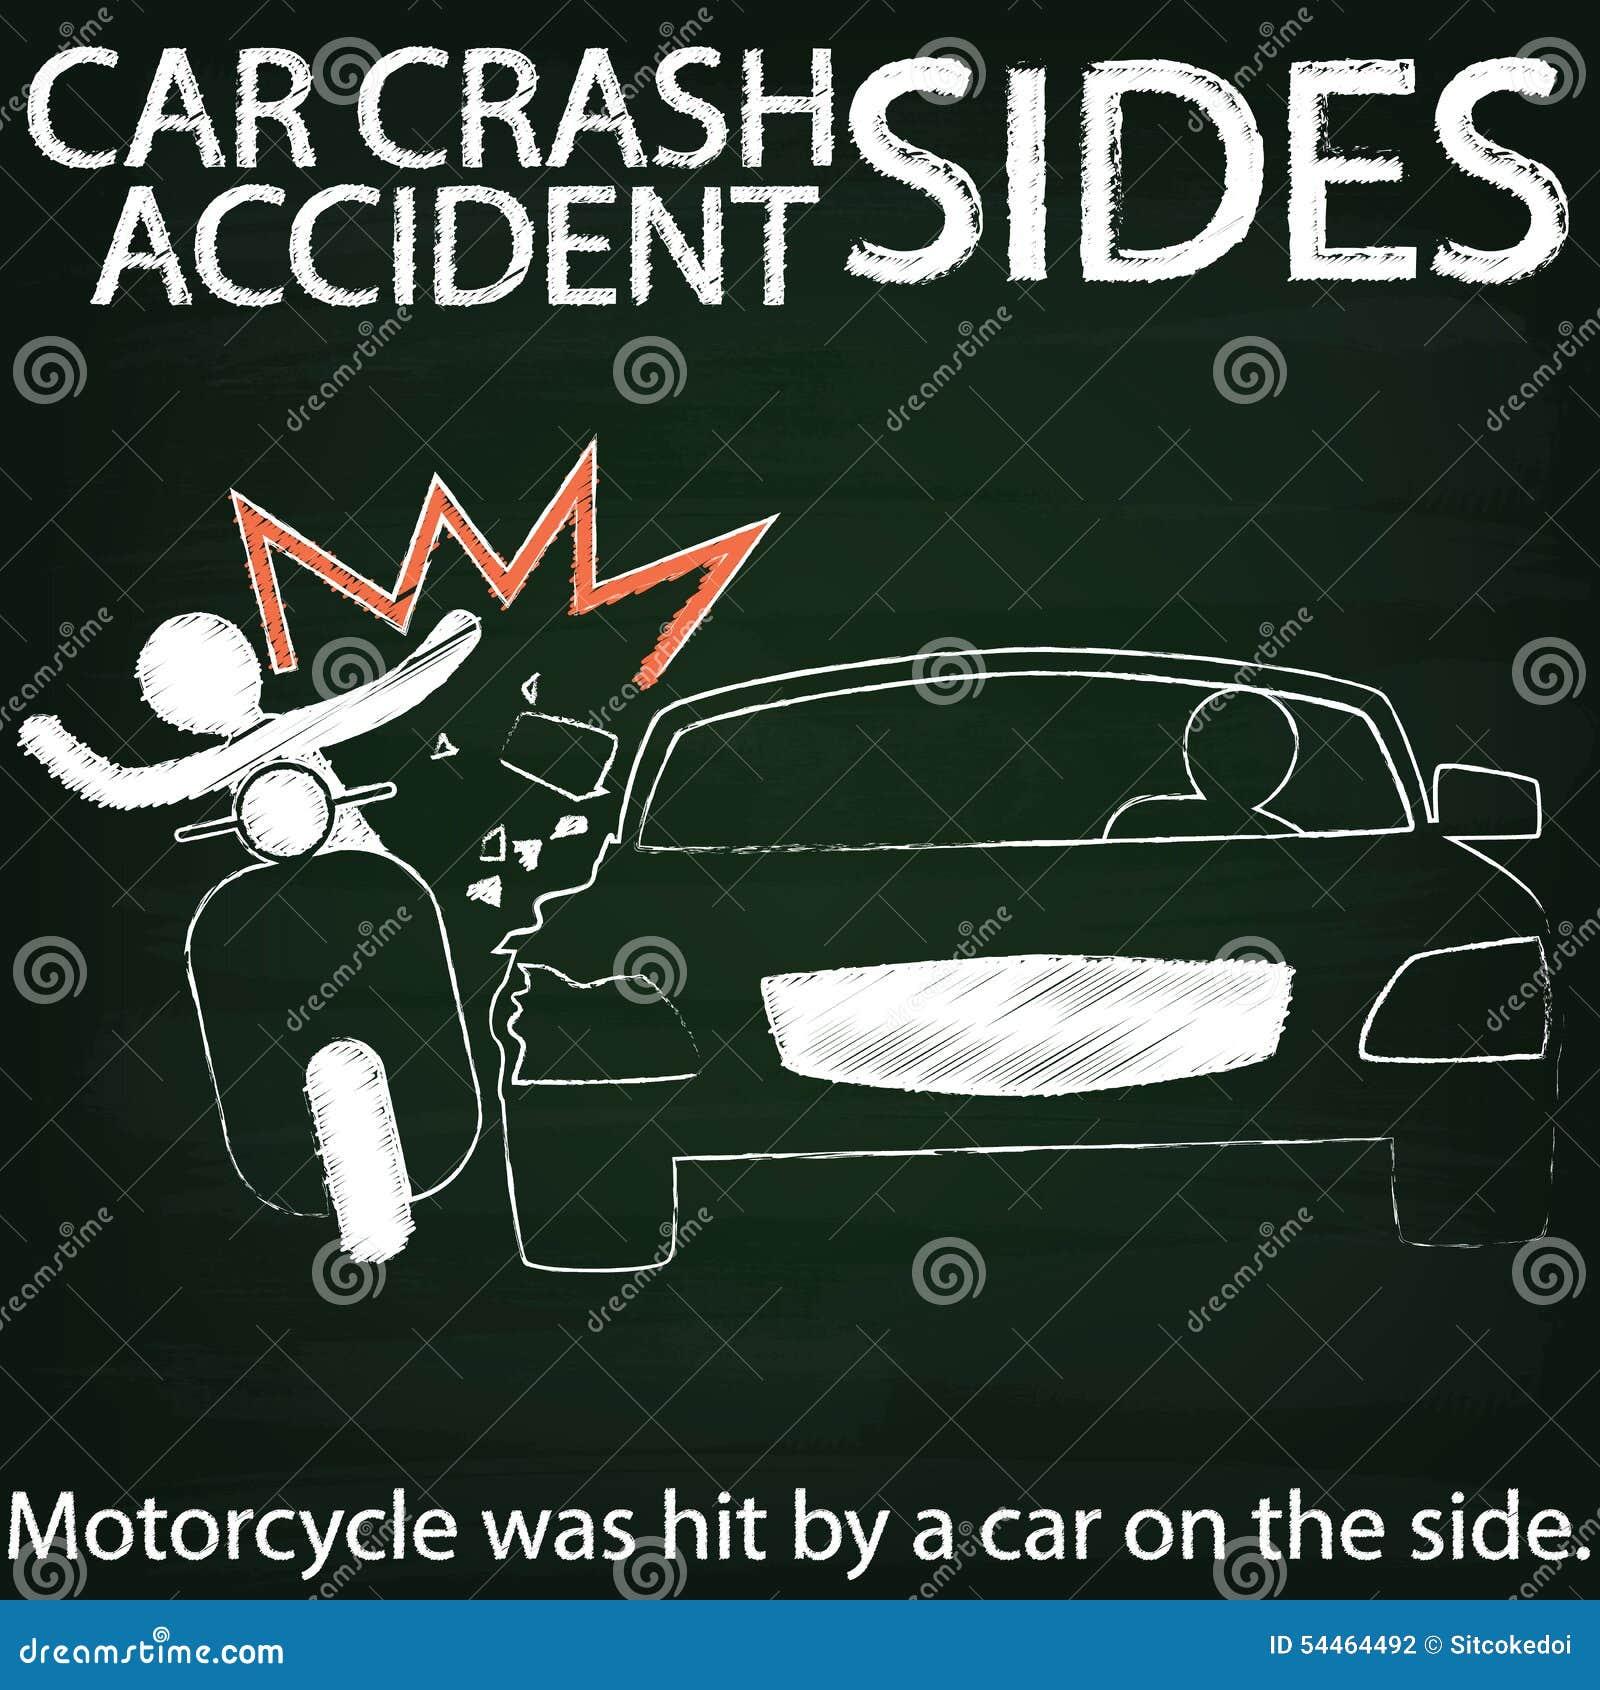 Lesbian car crash road sign motorbike